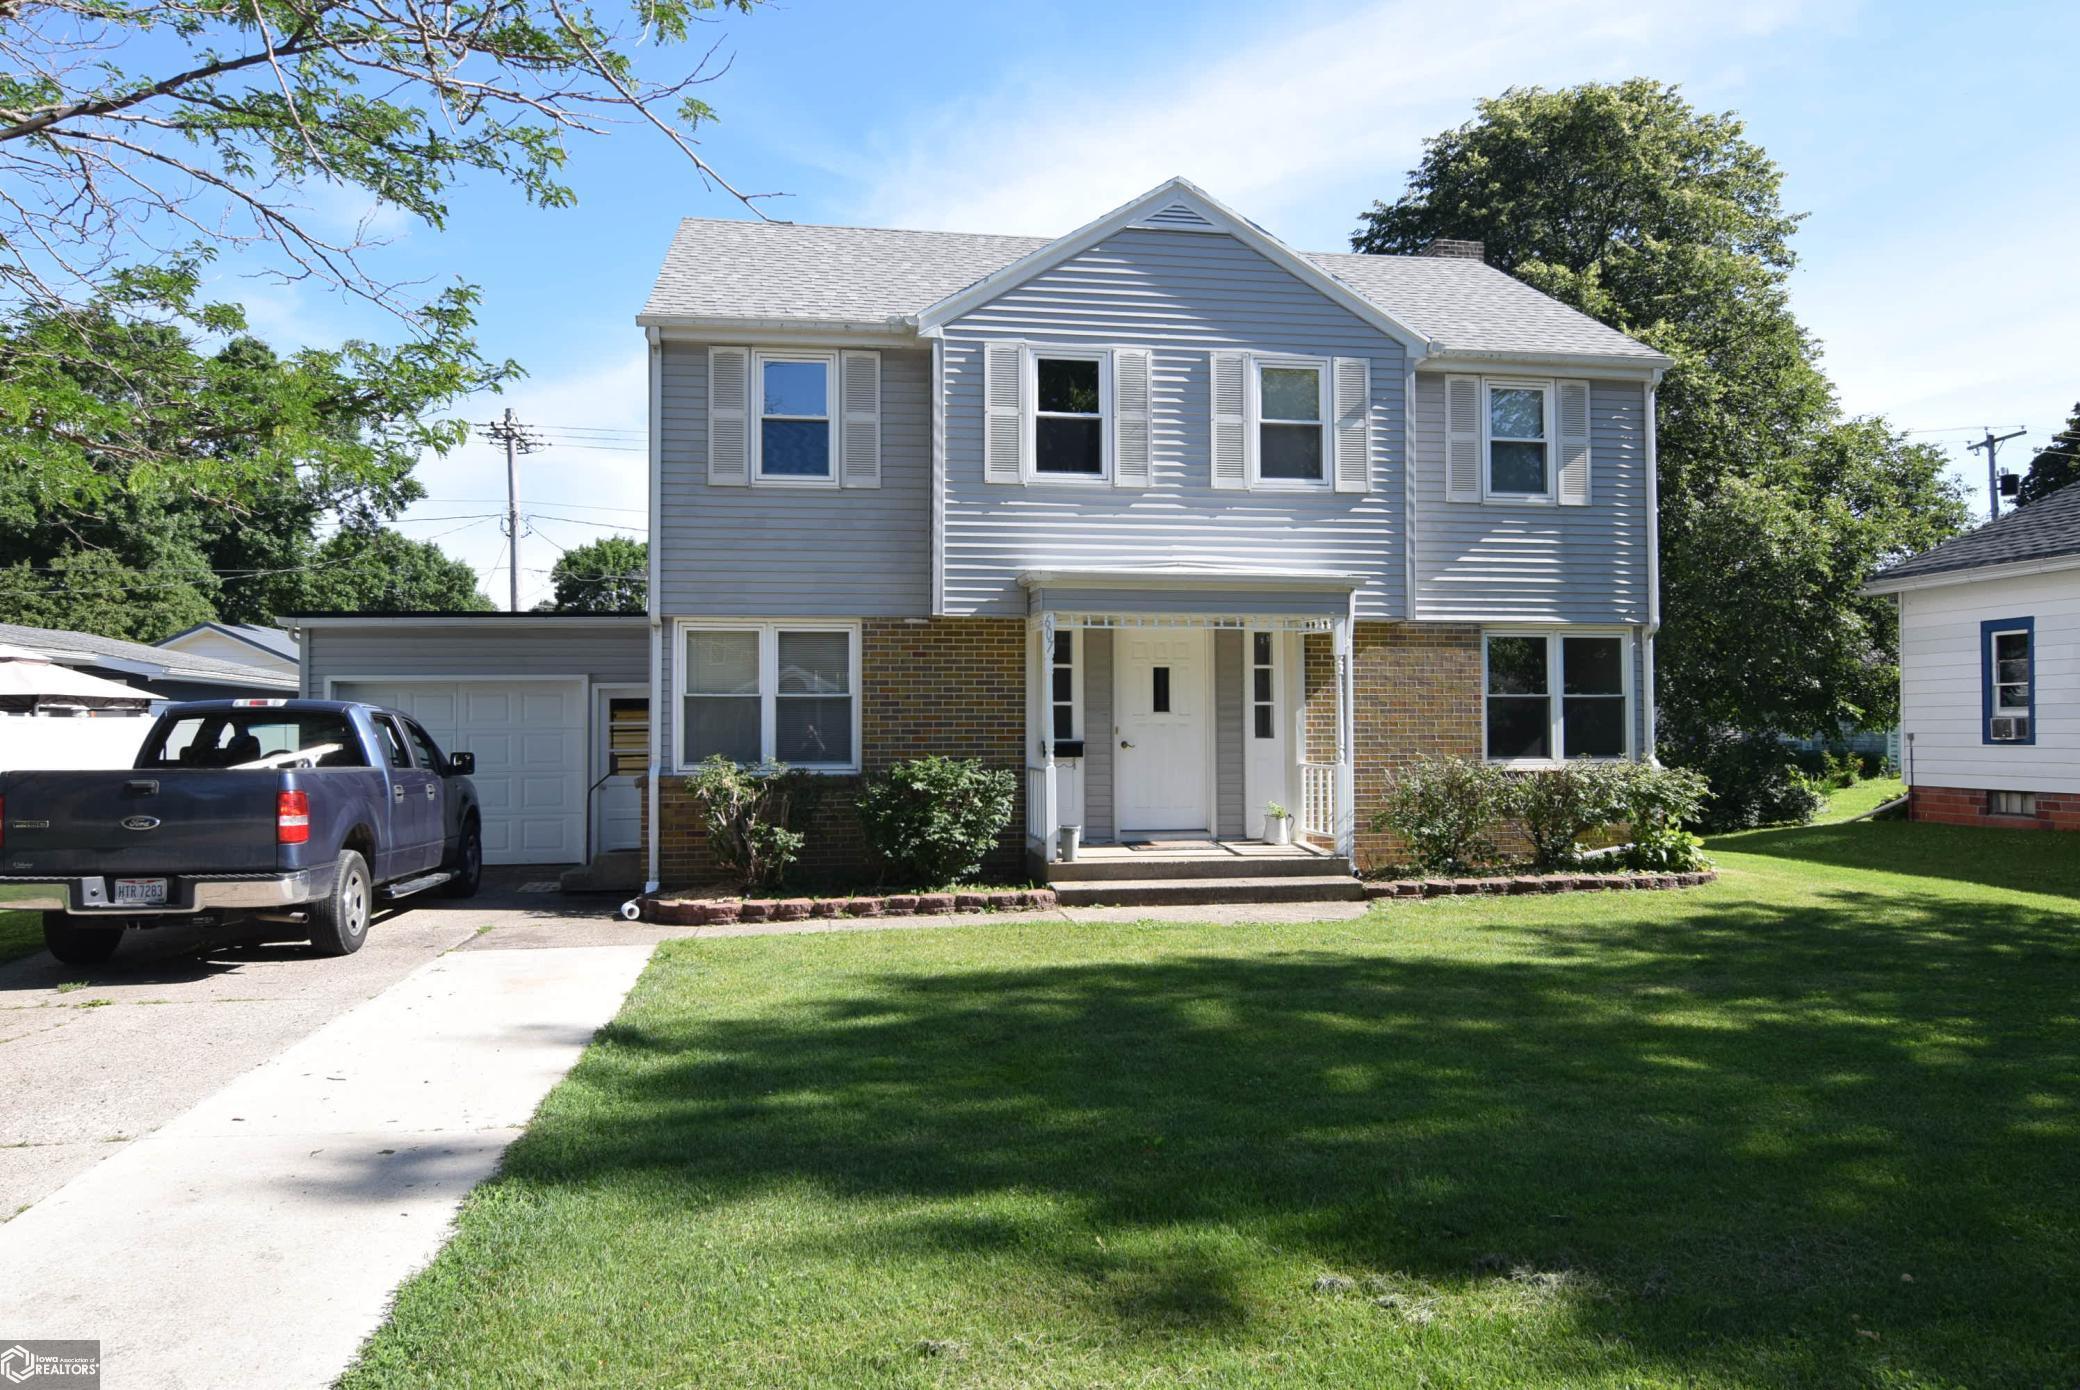 50421 Real Estate Listings Main Image